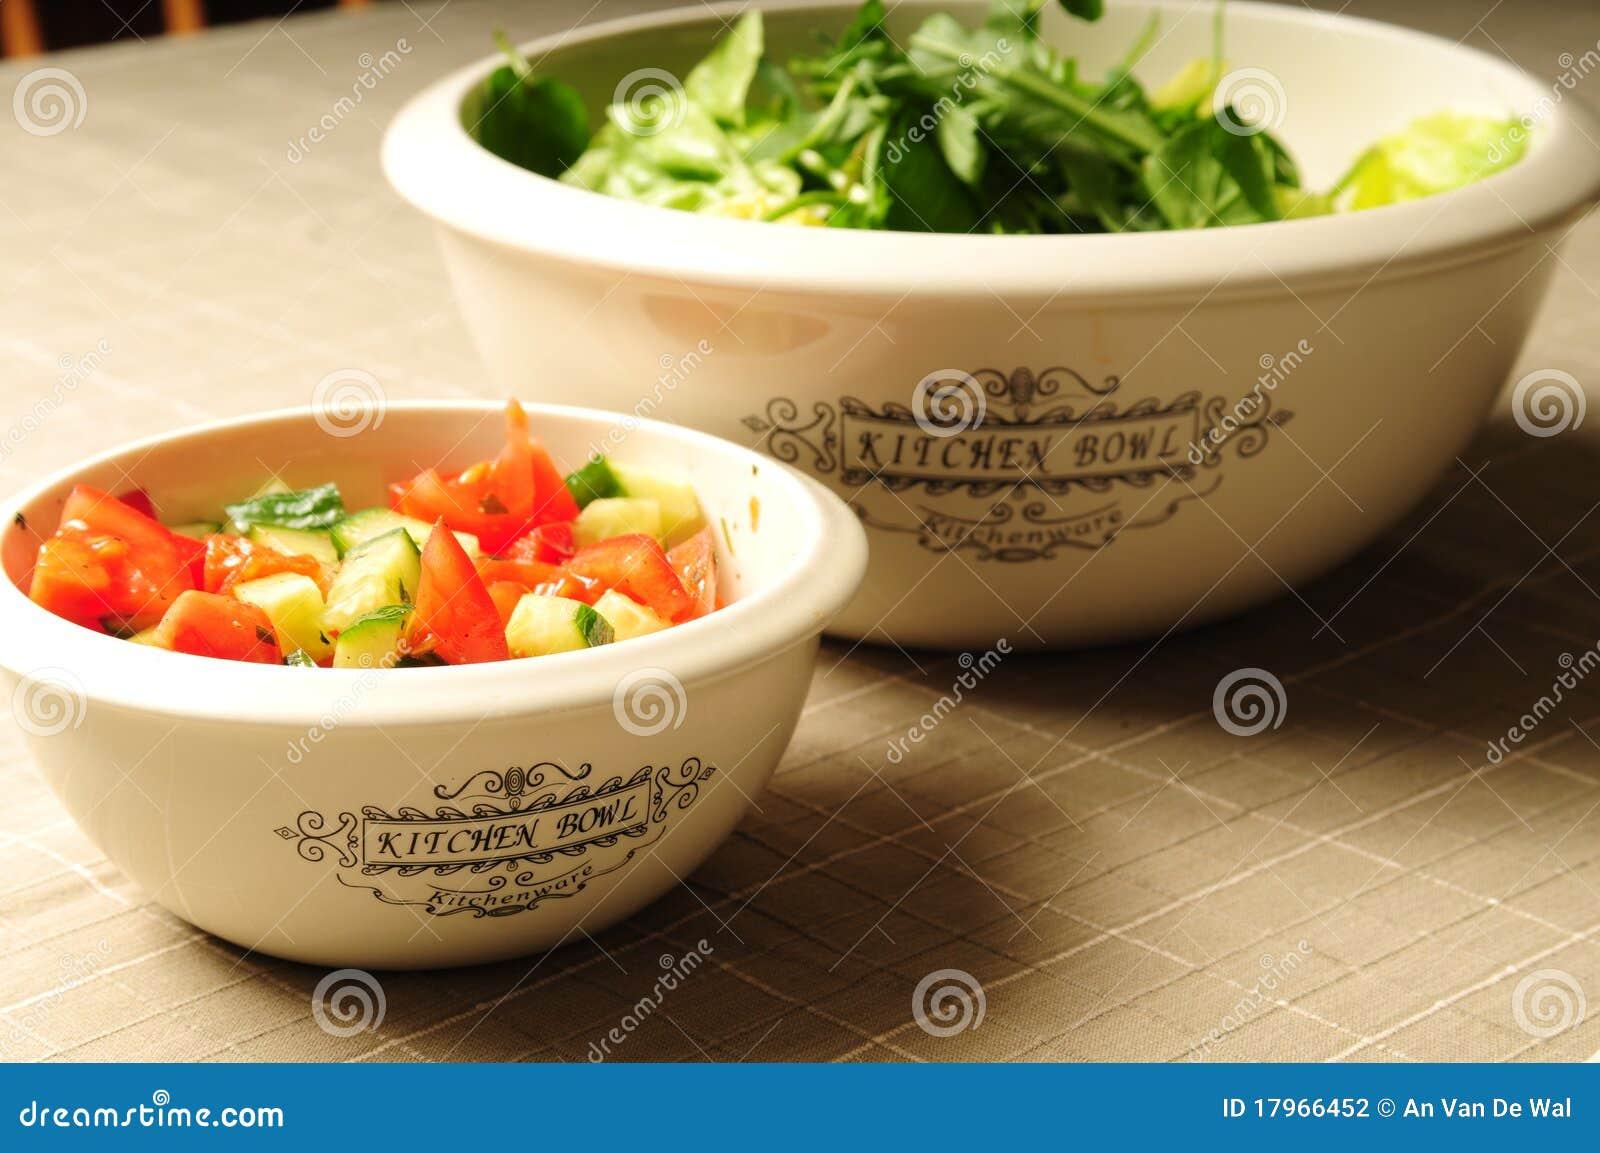 Twee keukenkommen die met verse salade worden gevuld